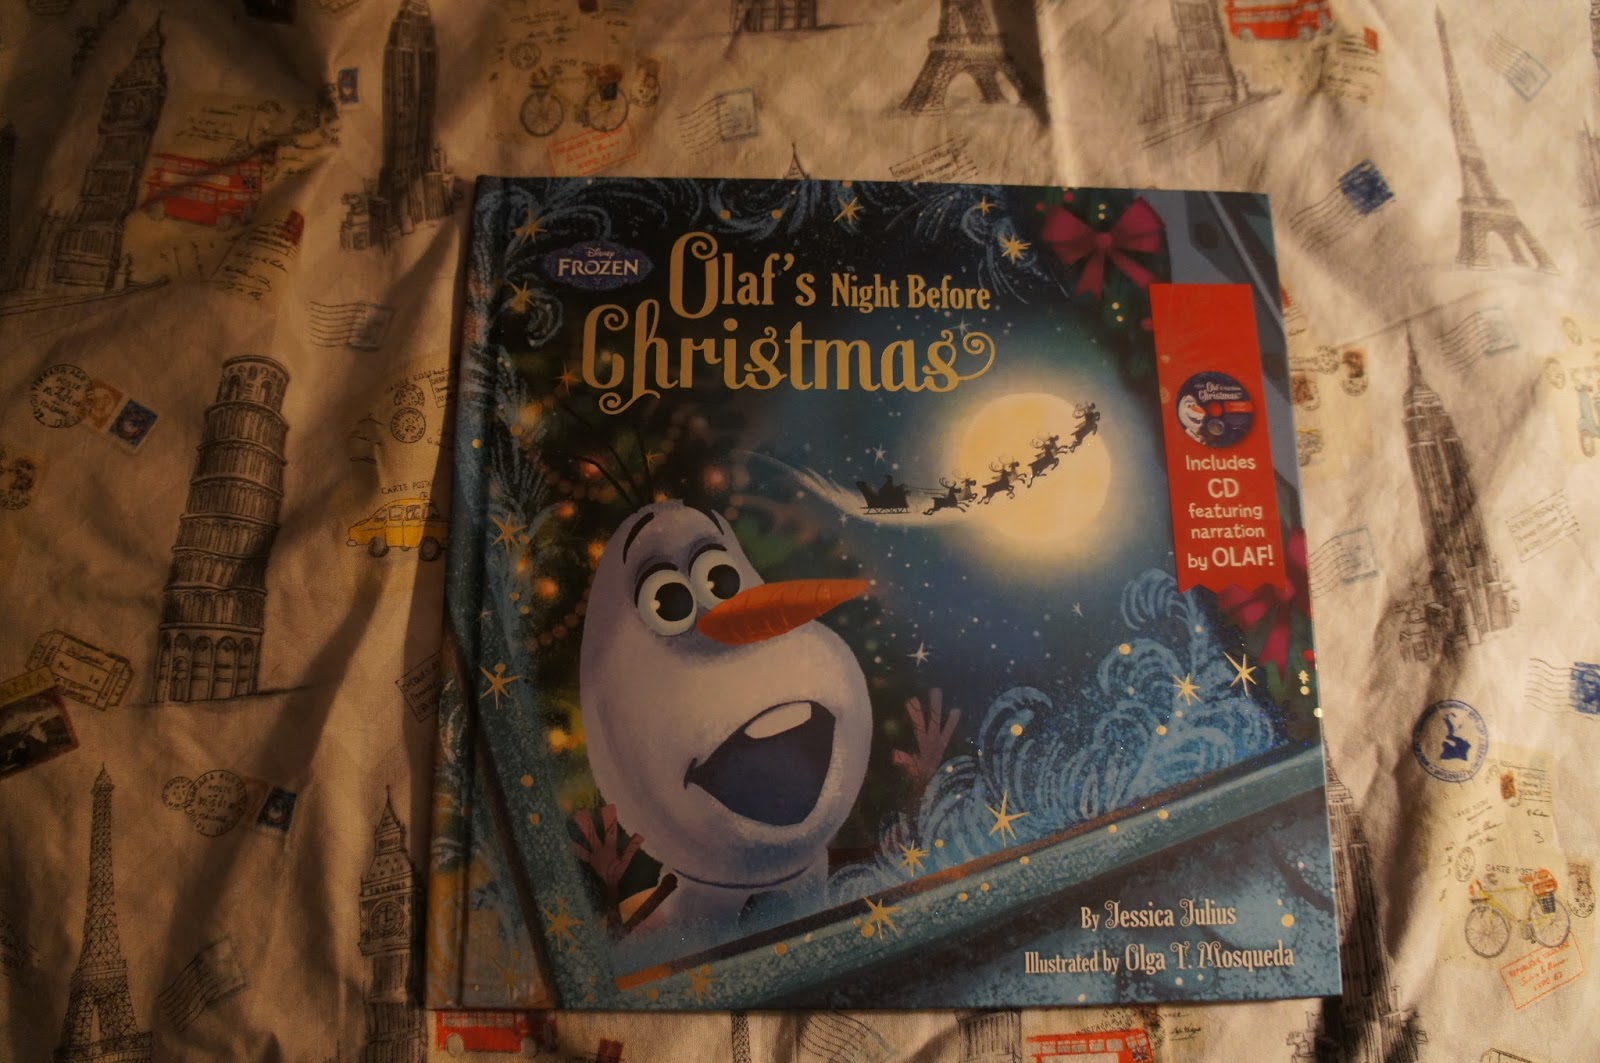 Picturing Disney: December 2015